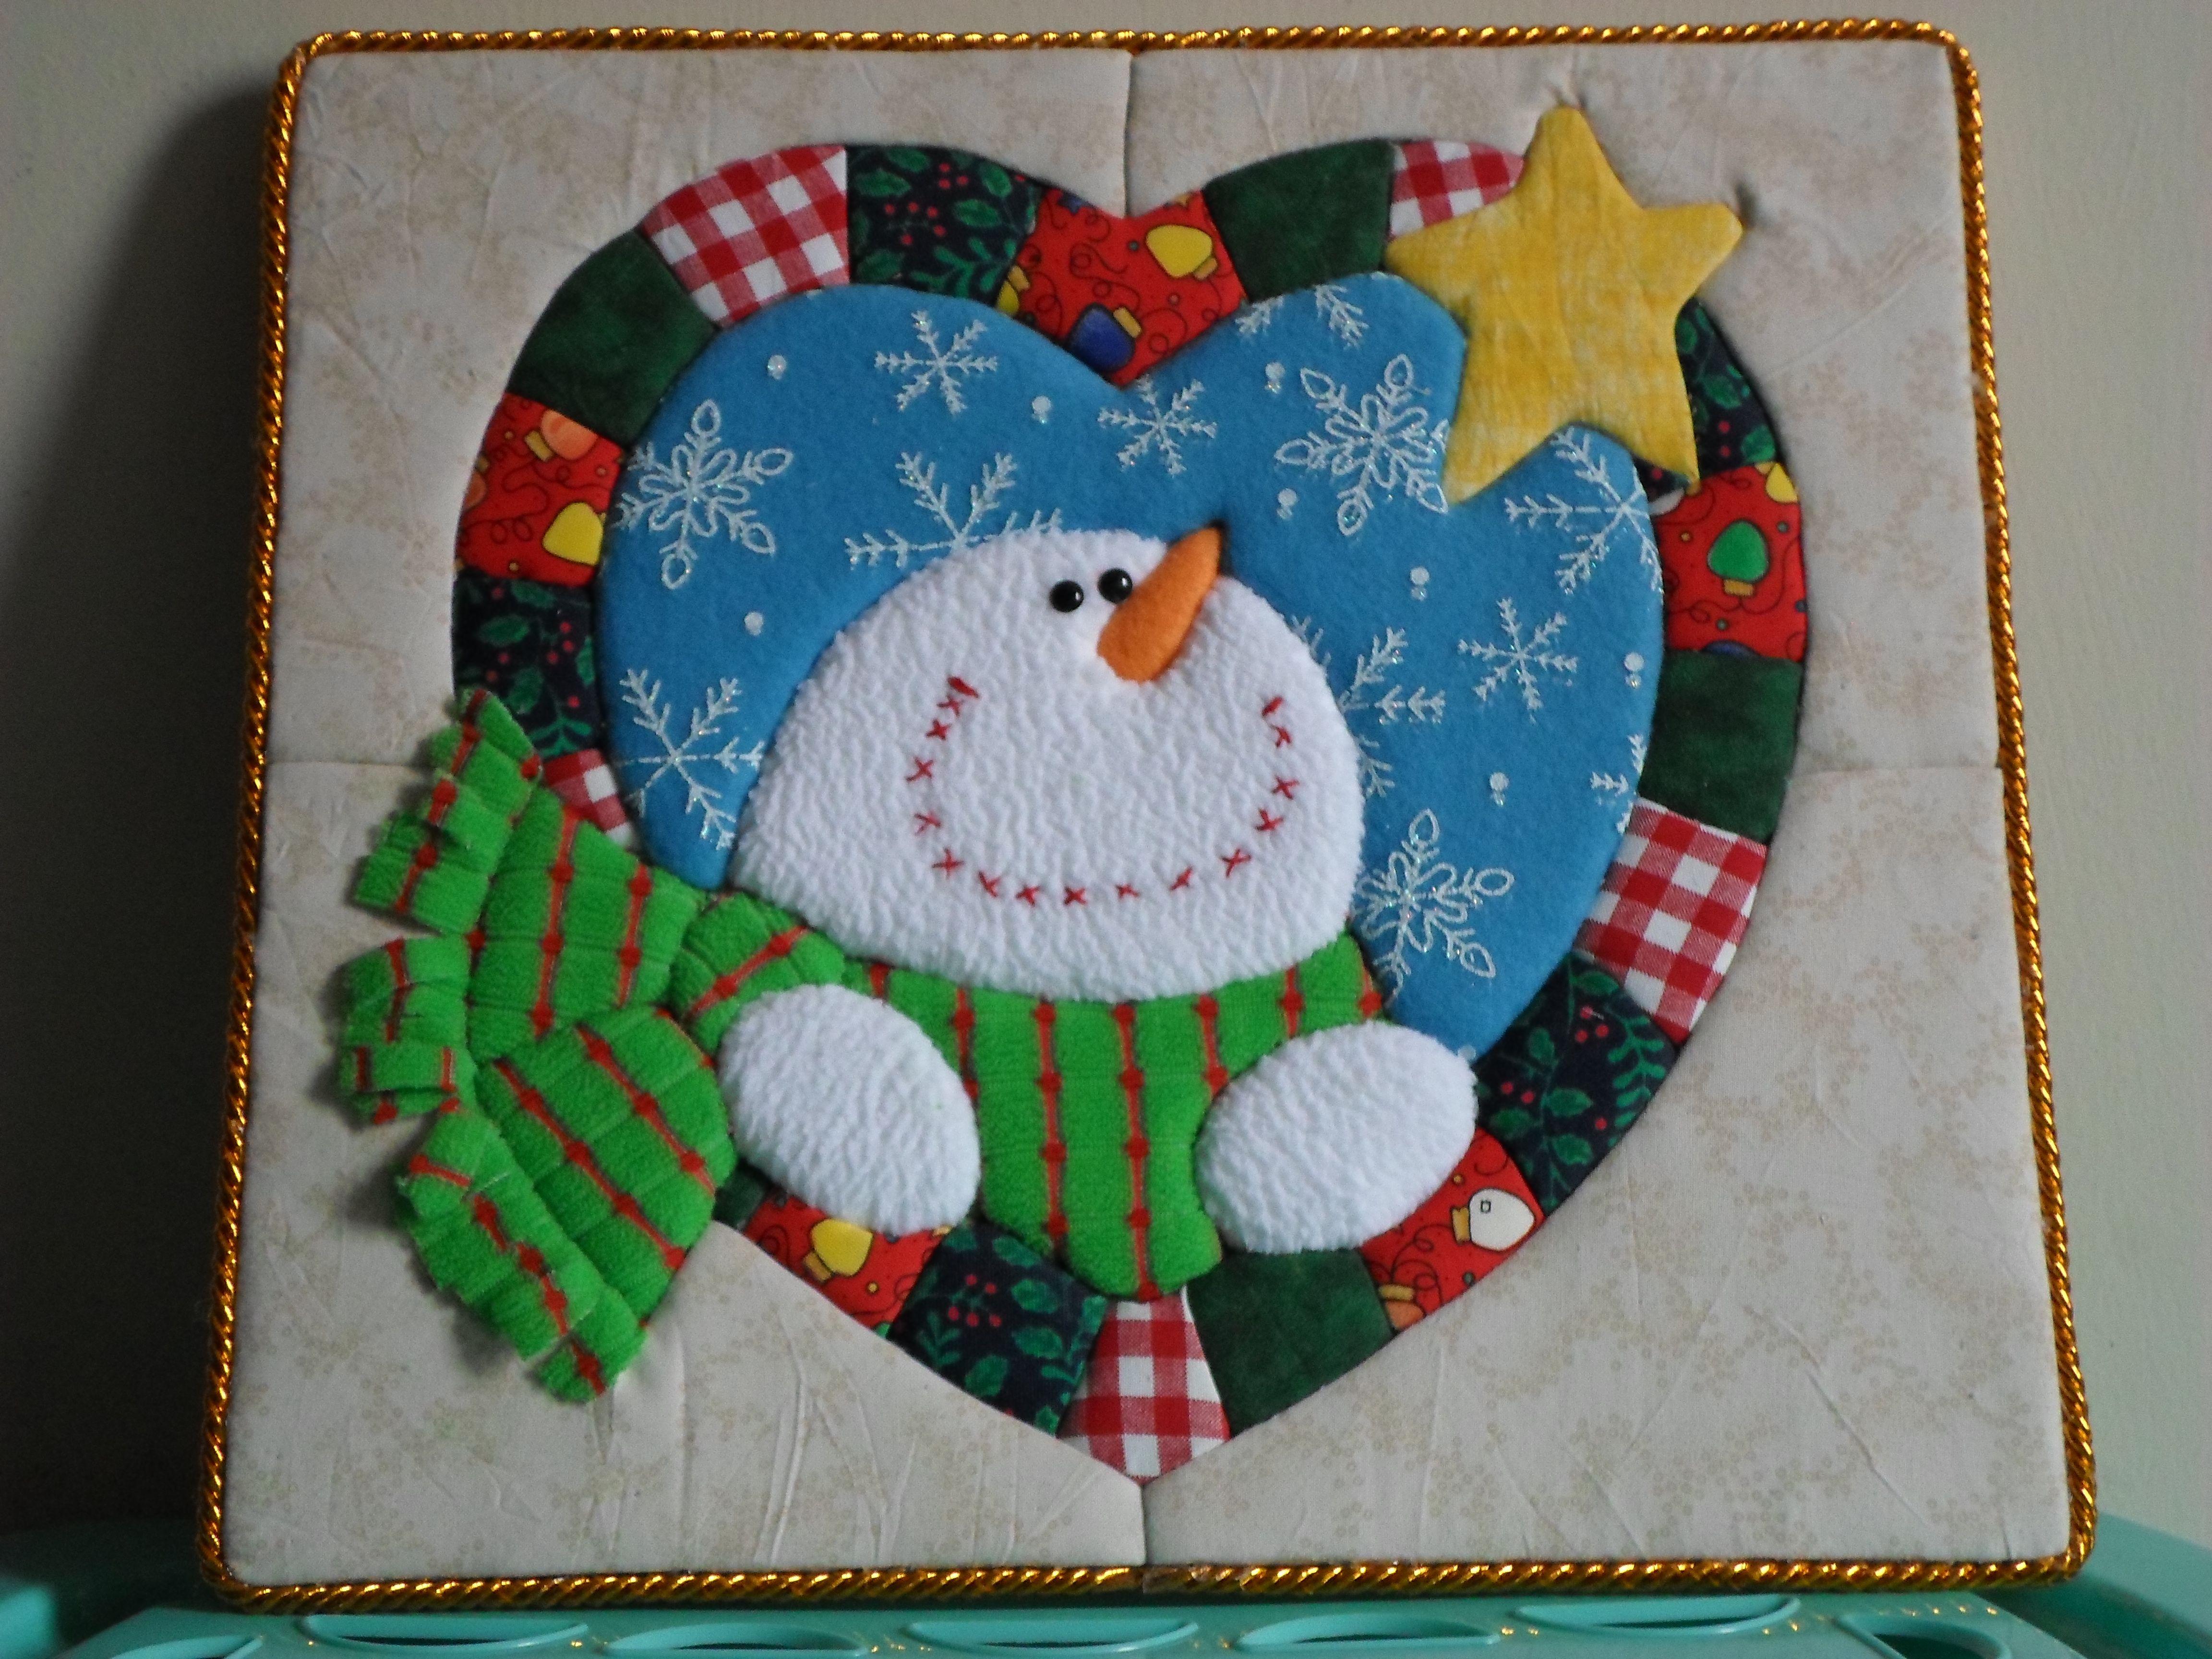 Cuadro navide o tecnica patchwork sin aguja fieltro for Cuadros de navidad